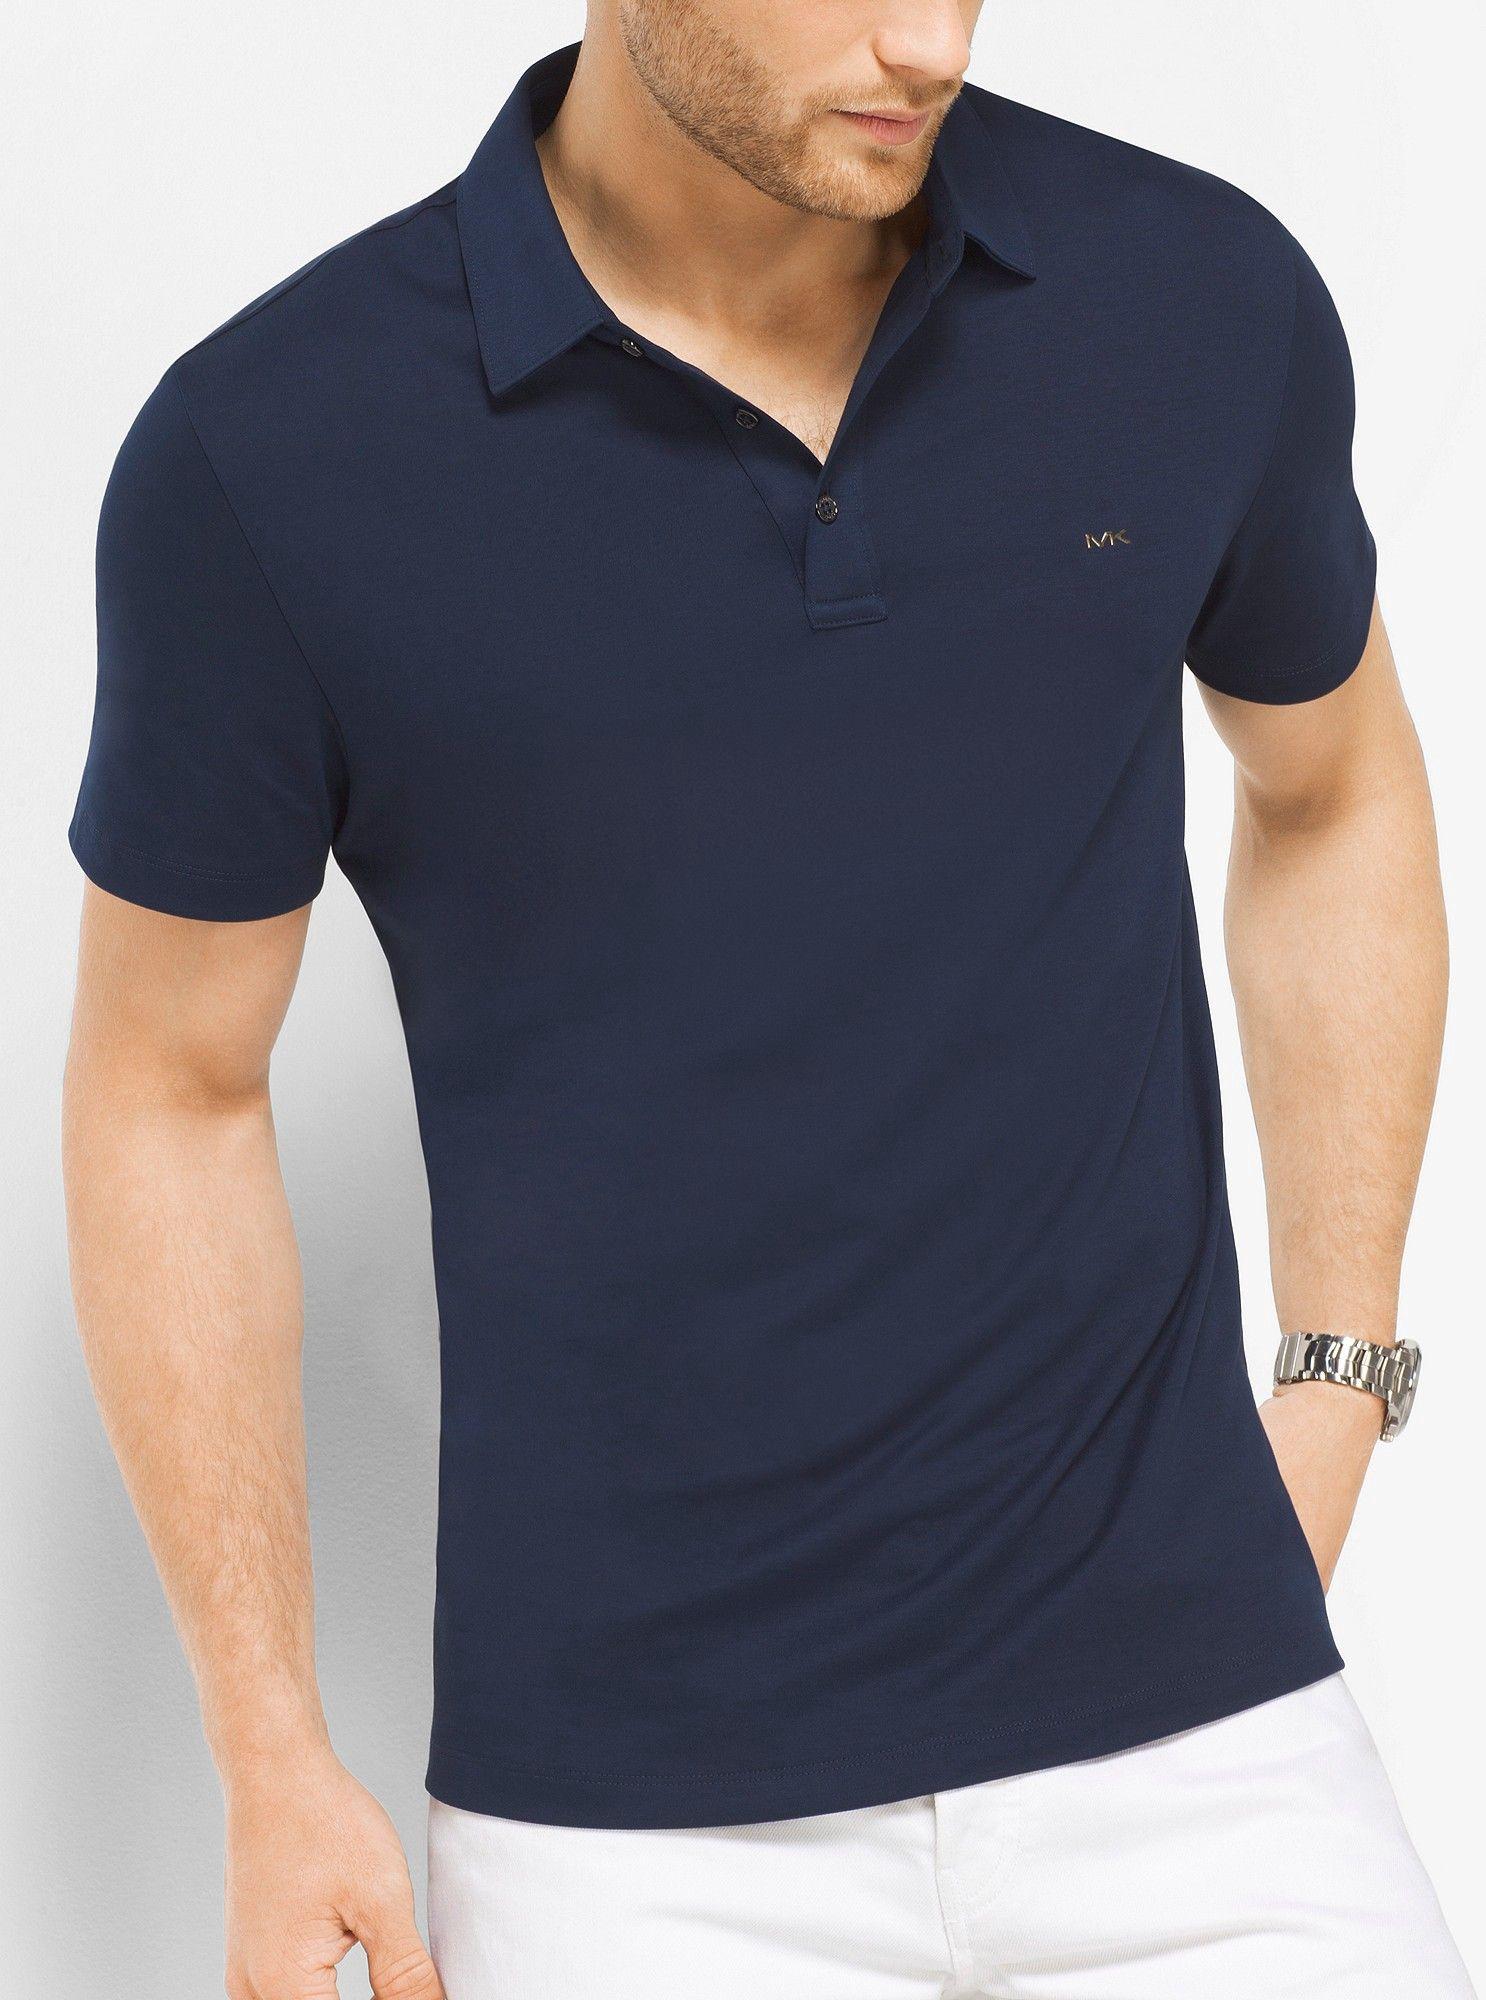 a888e3ac8c955 Michael Kors Cotton Polo Shirt - Heather Grey Xxl